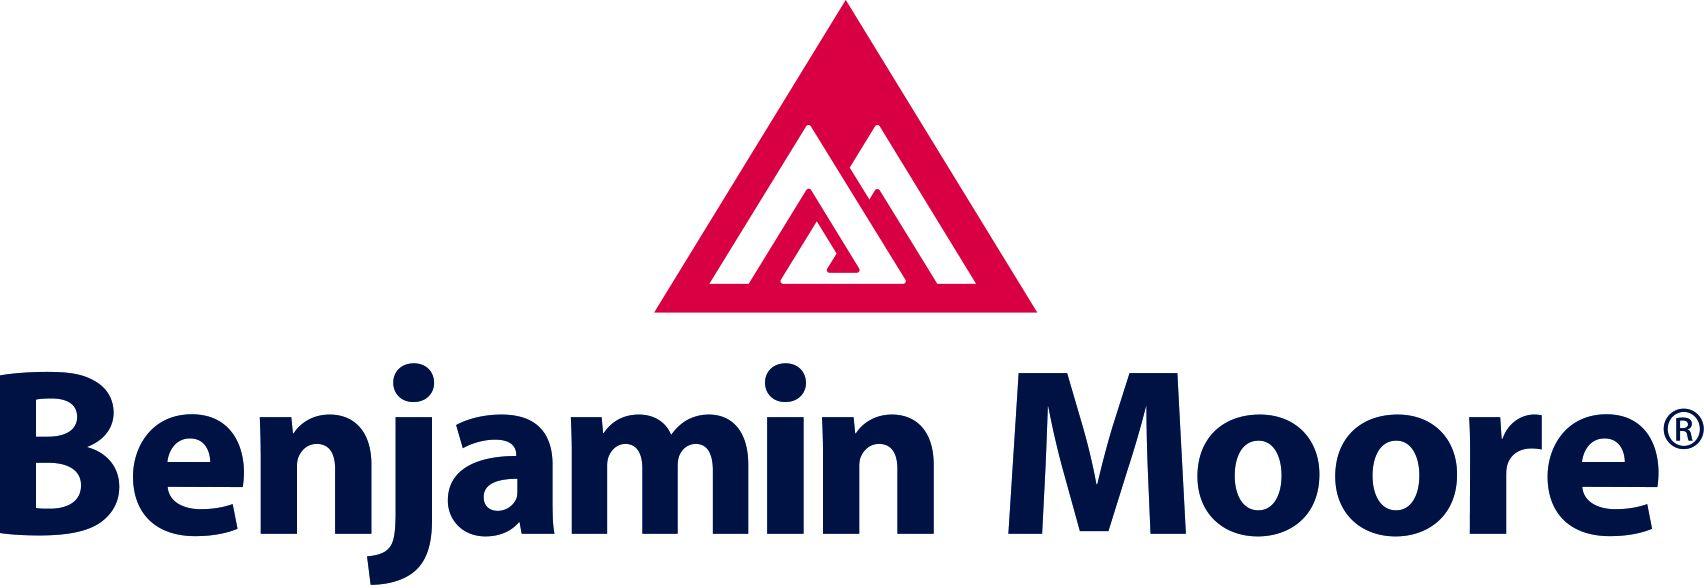 Benjamin-Moore-Preffered-Logo-2020